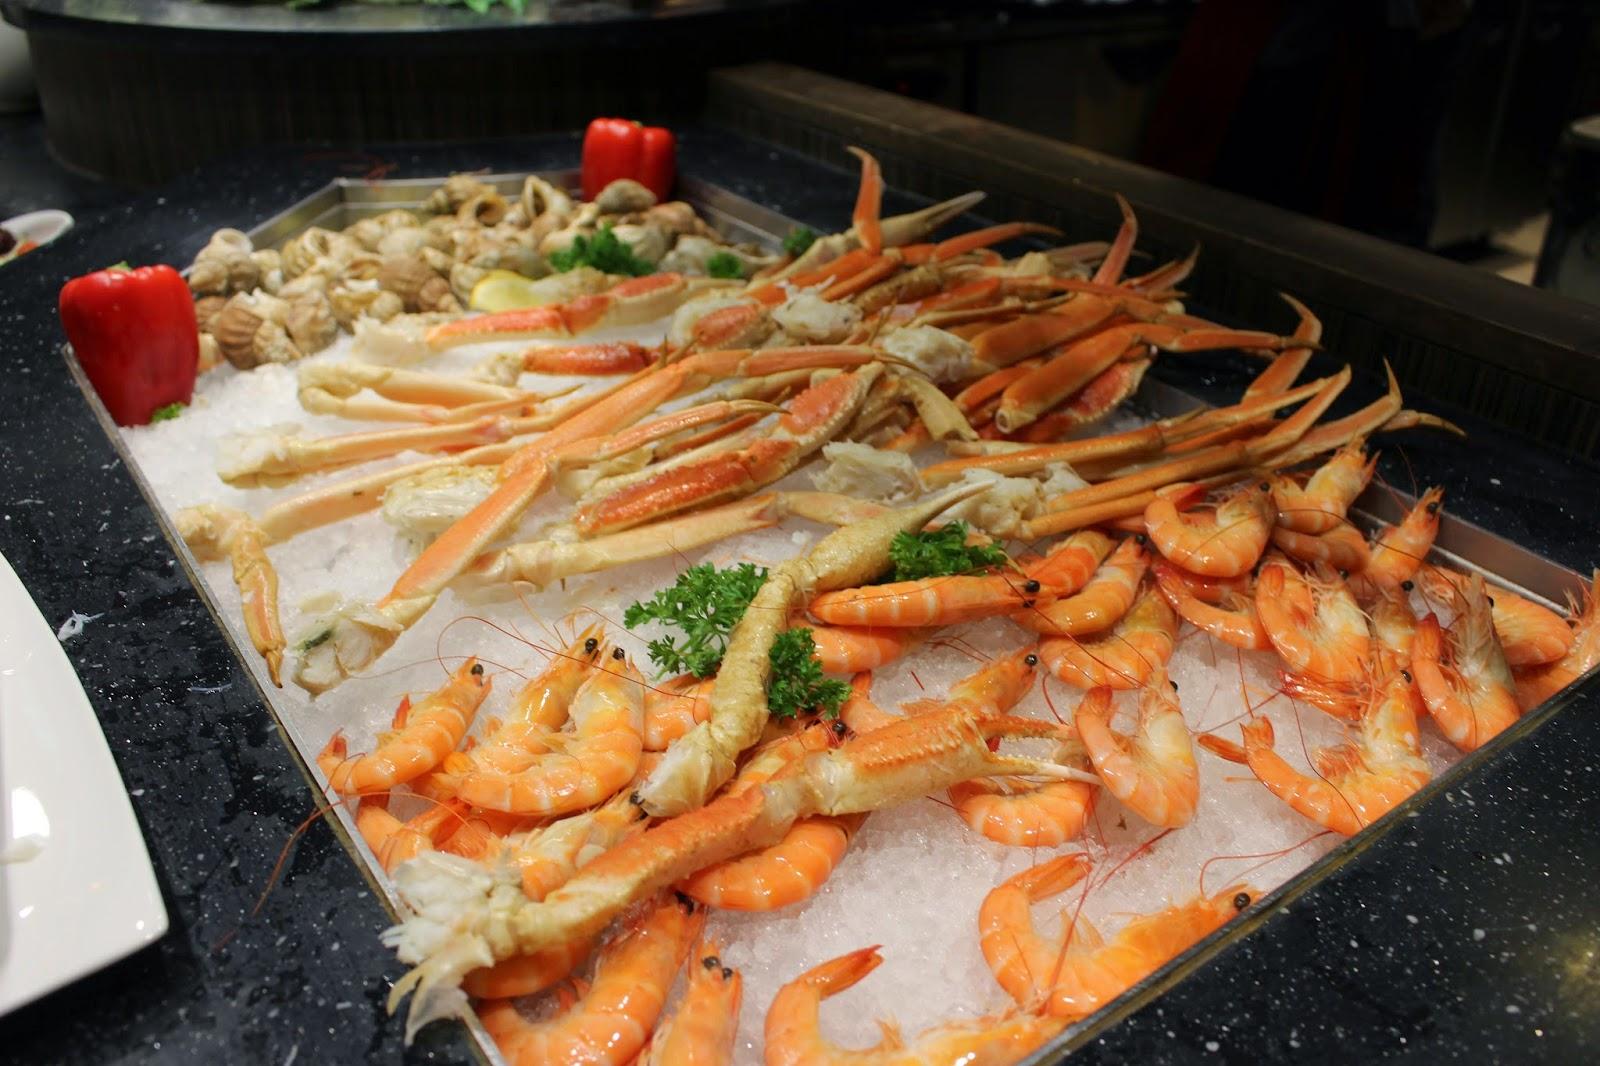 king crab buffet momiji japanese buffet jacqsowhat food travel rh jacqsowhat com king crab buffet prices king crab buffet chicago